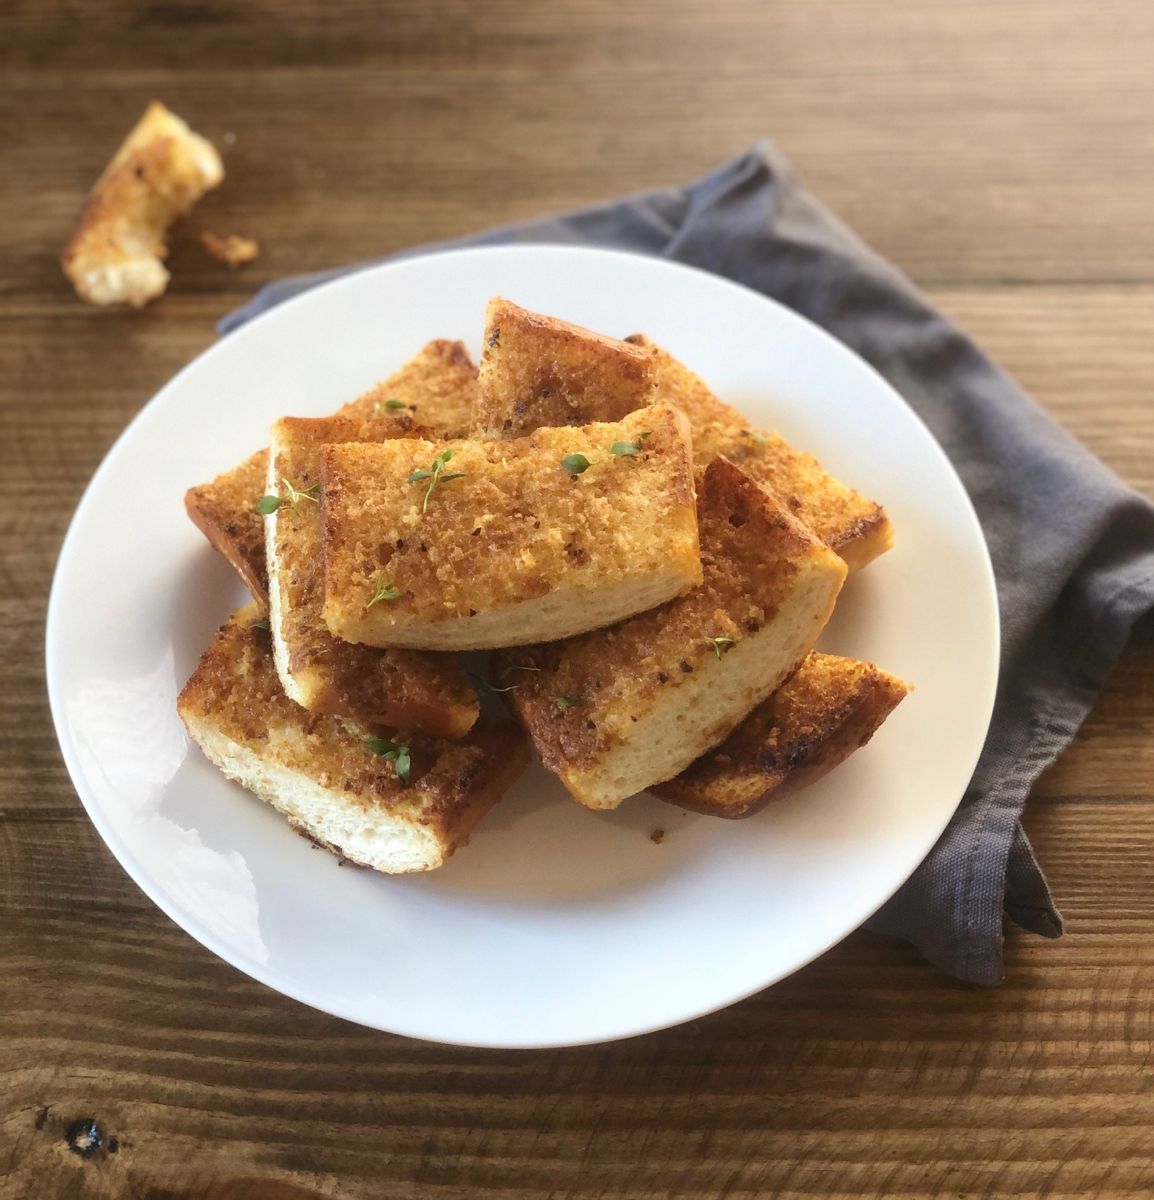 Garlic Bread Best Garlic Bread Recipe Cooking Blog Personal Cooking